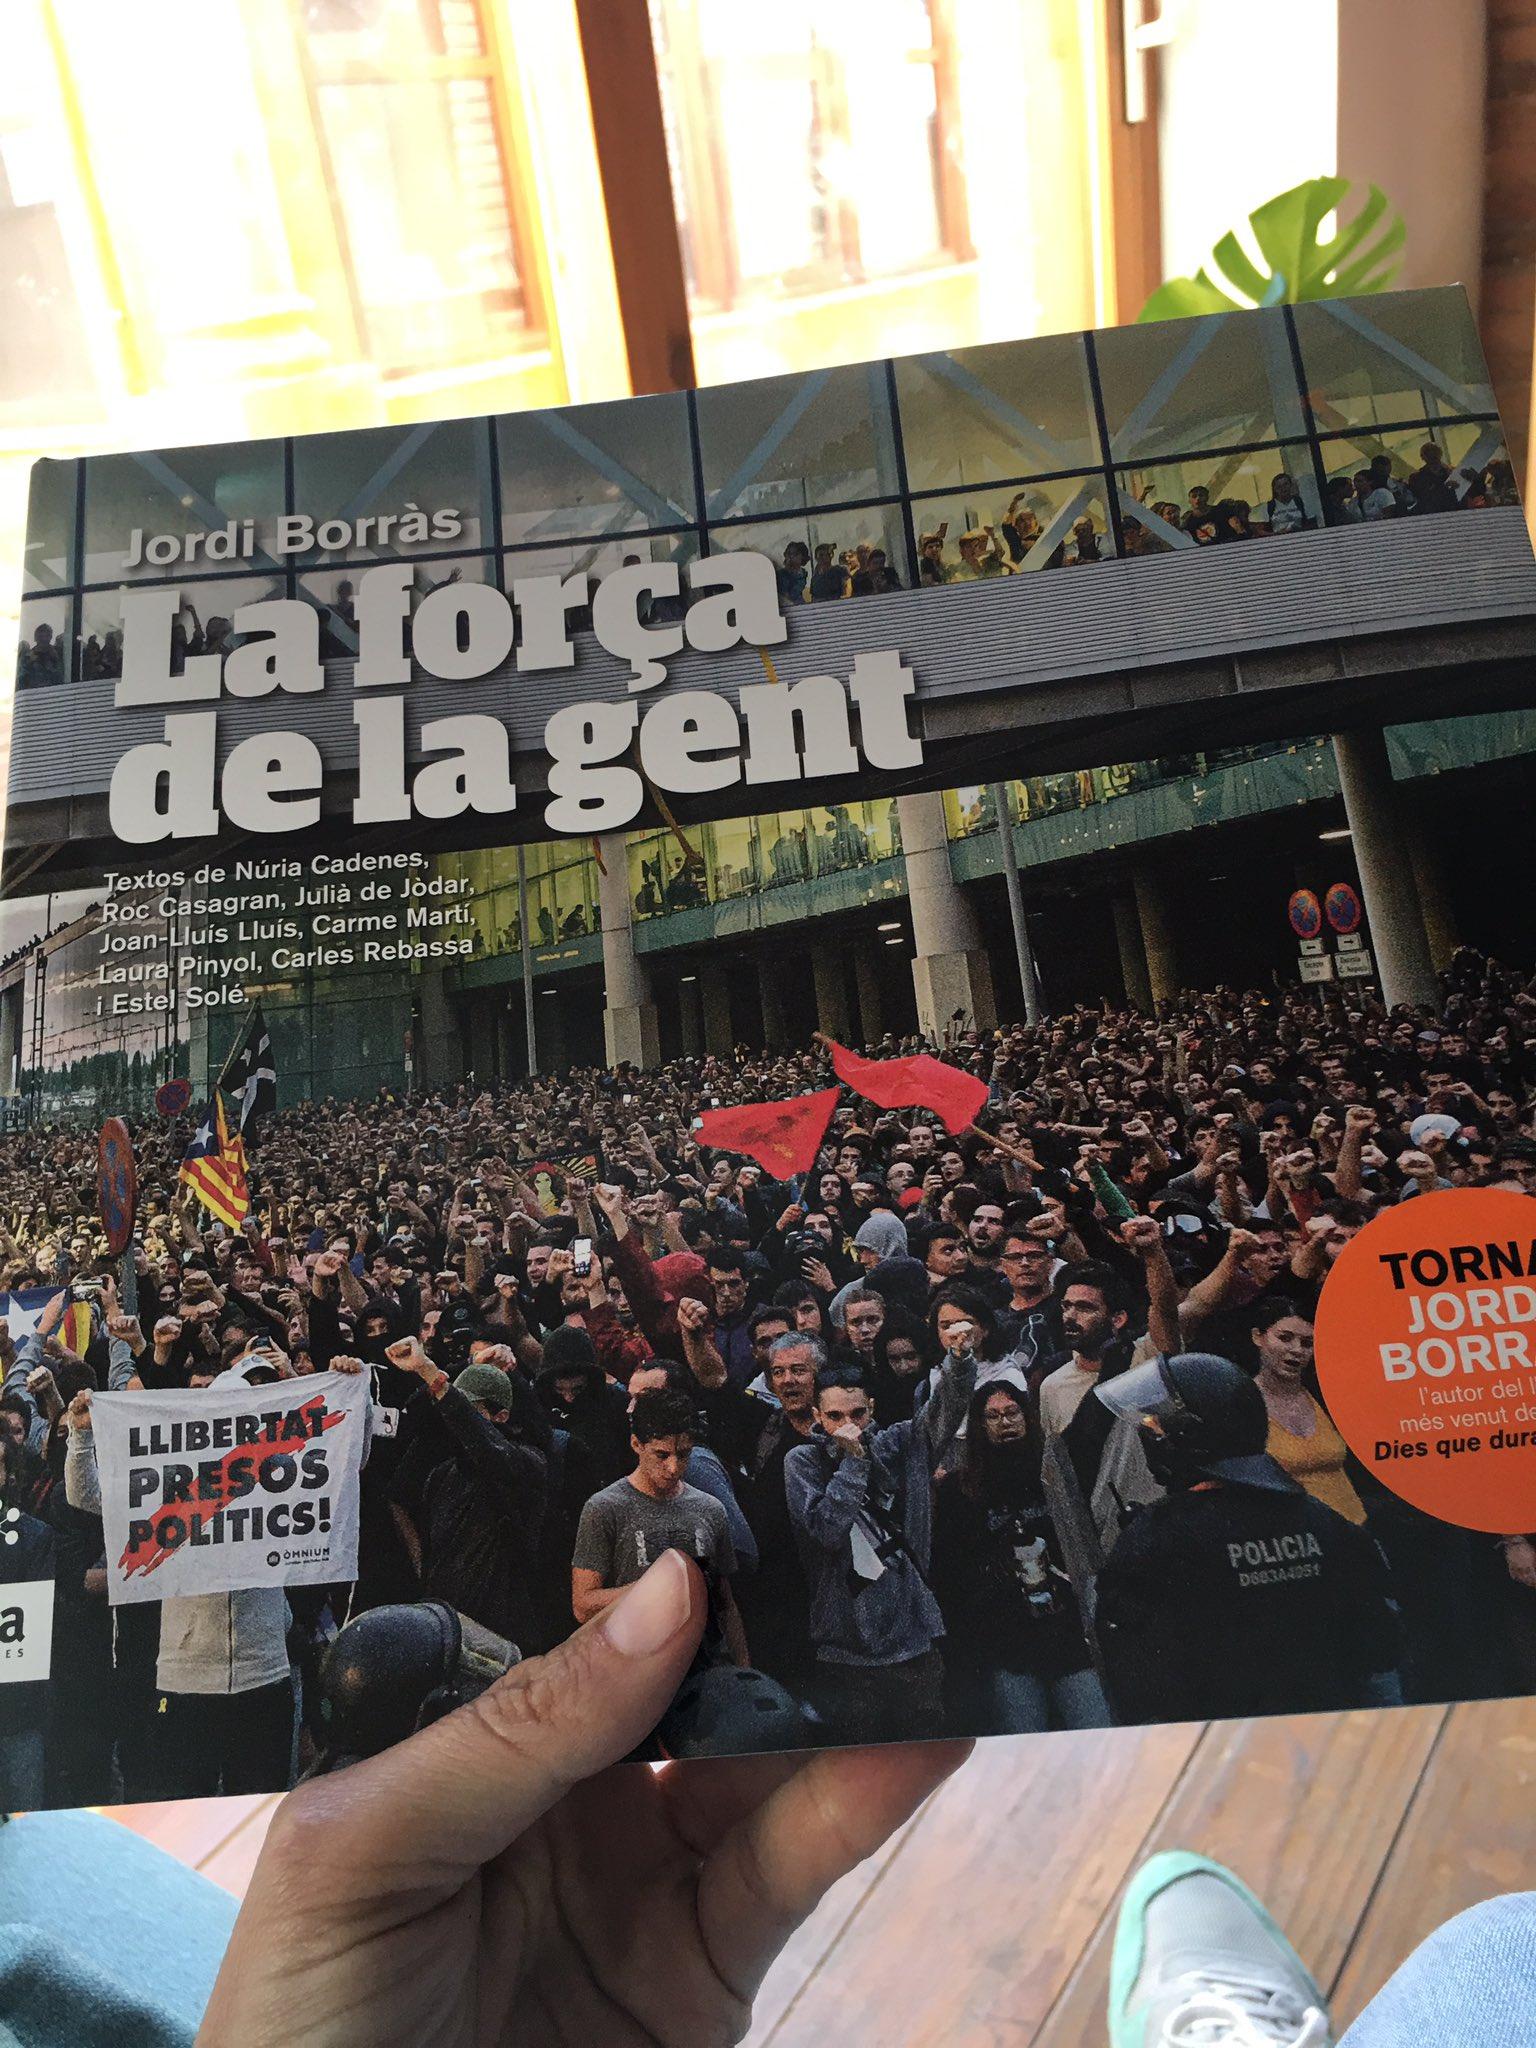 Ja ha arribat!  @jordiborras  @arallibres   #Laforçadelagent https://t.co/0g3XGAHglc